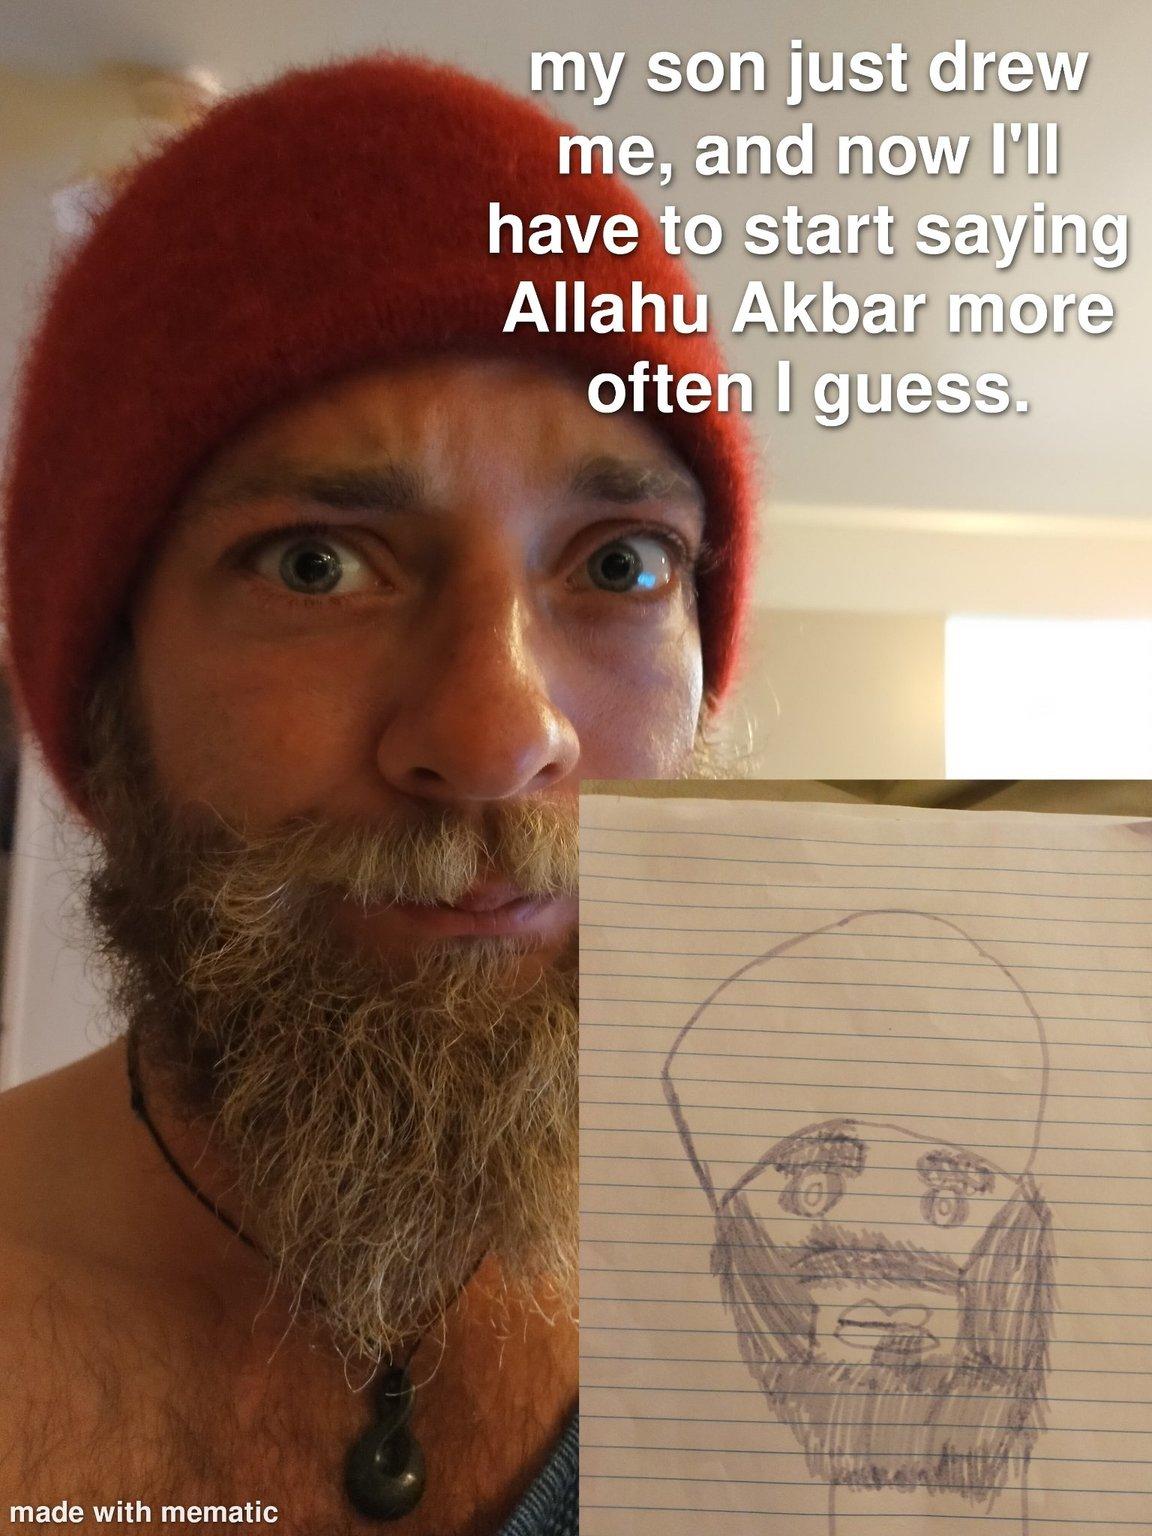 Guess I'm a Muslim now - meme